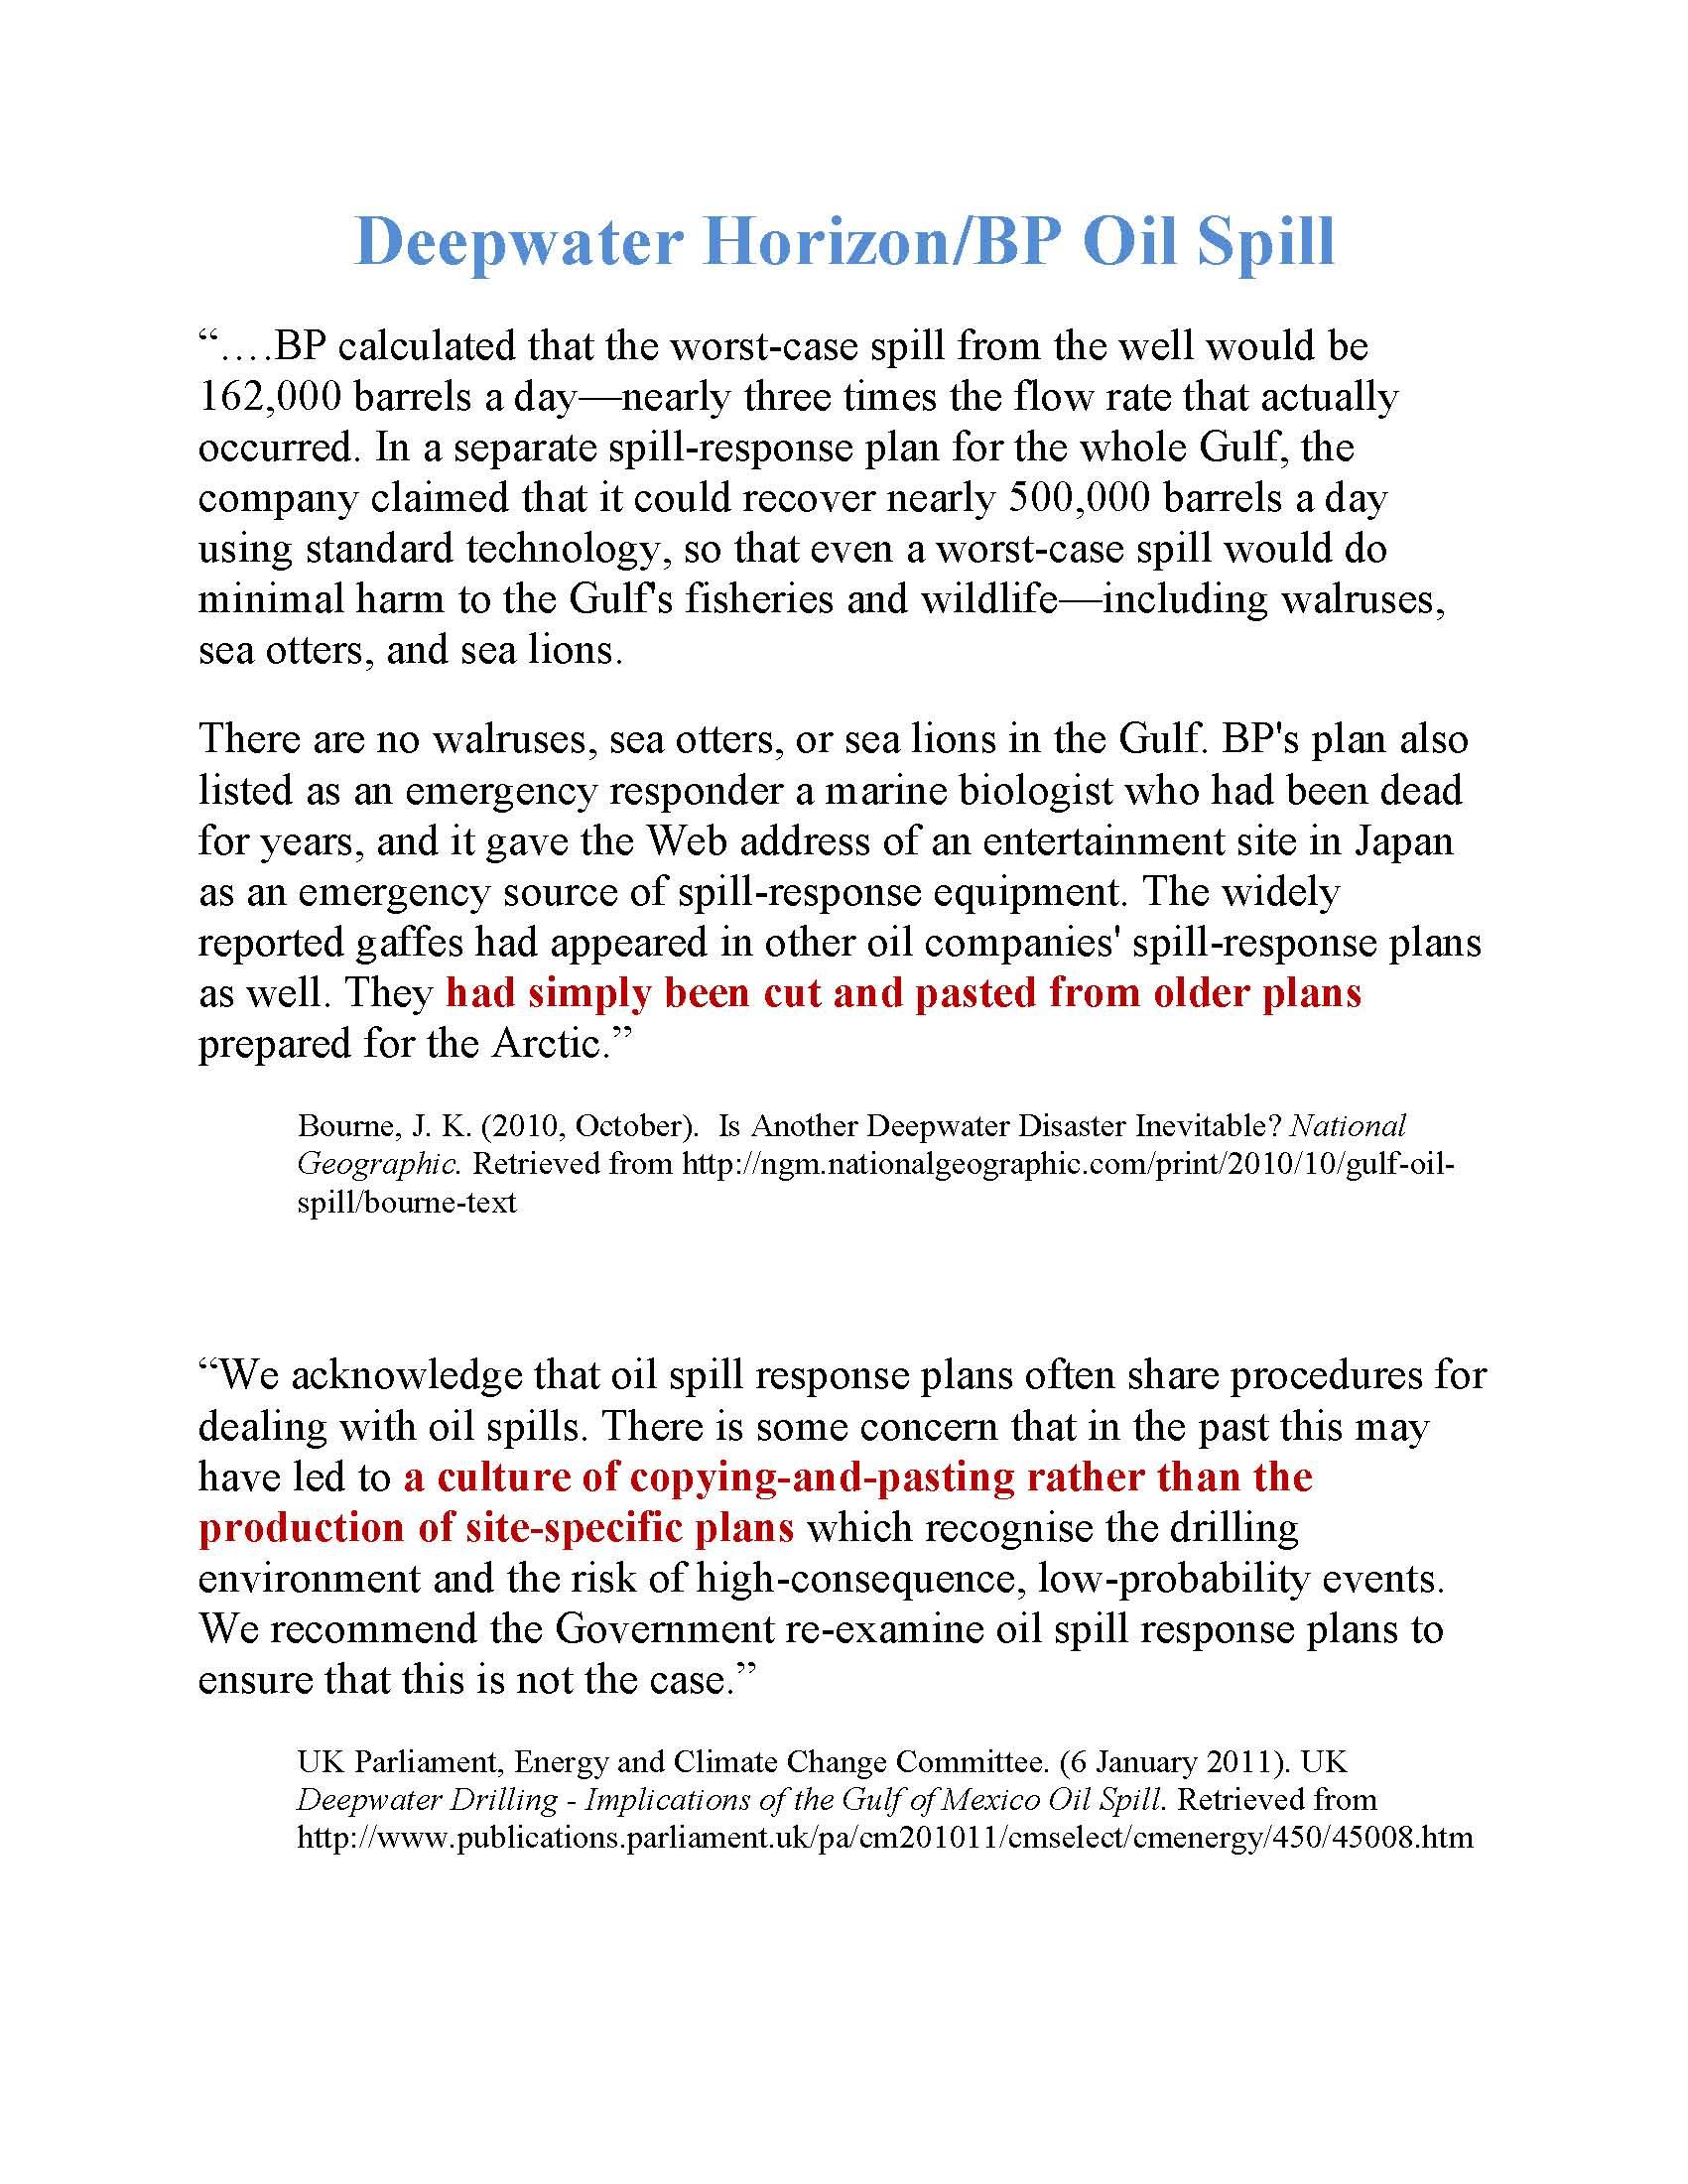 ohio college subjects website plagiarism laws